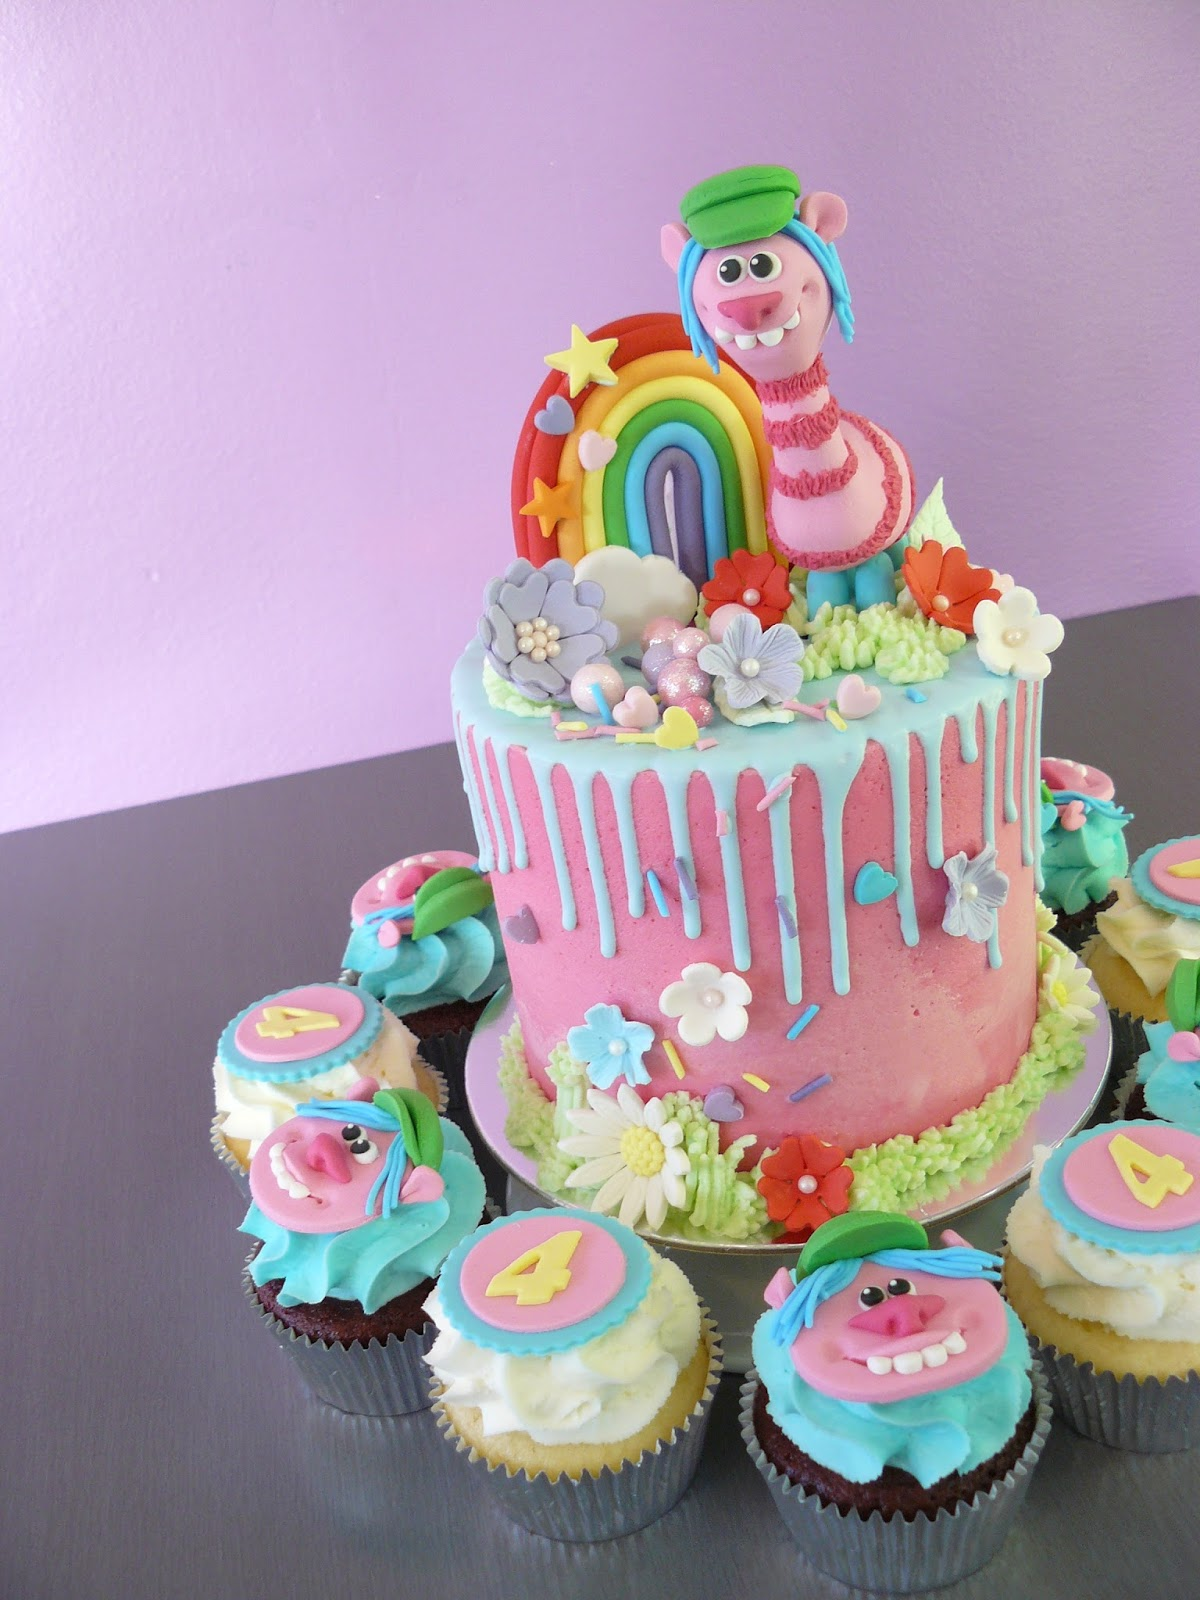 The Cup Cake Taste Brisbane Cupcakes